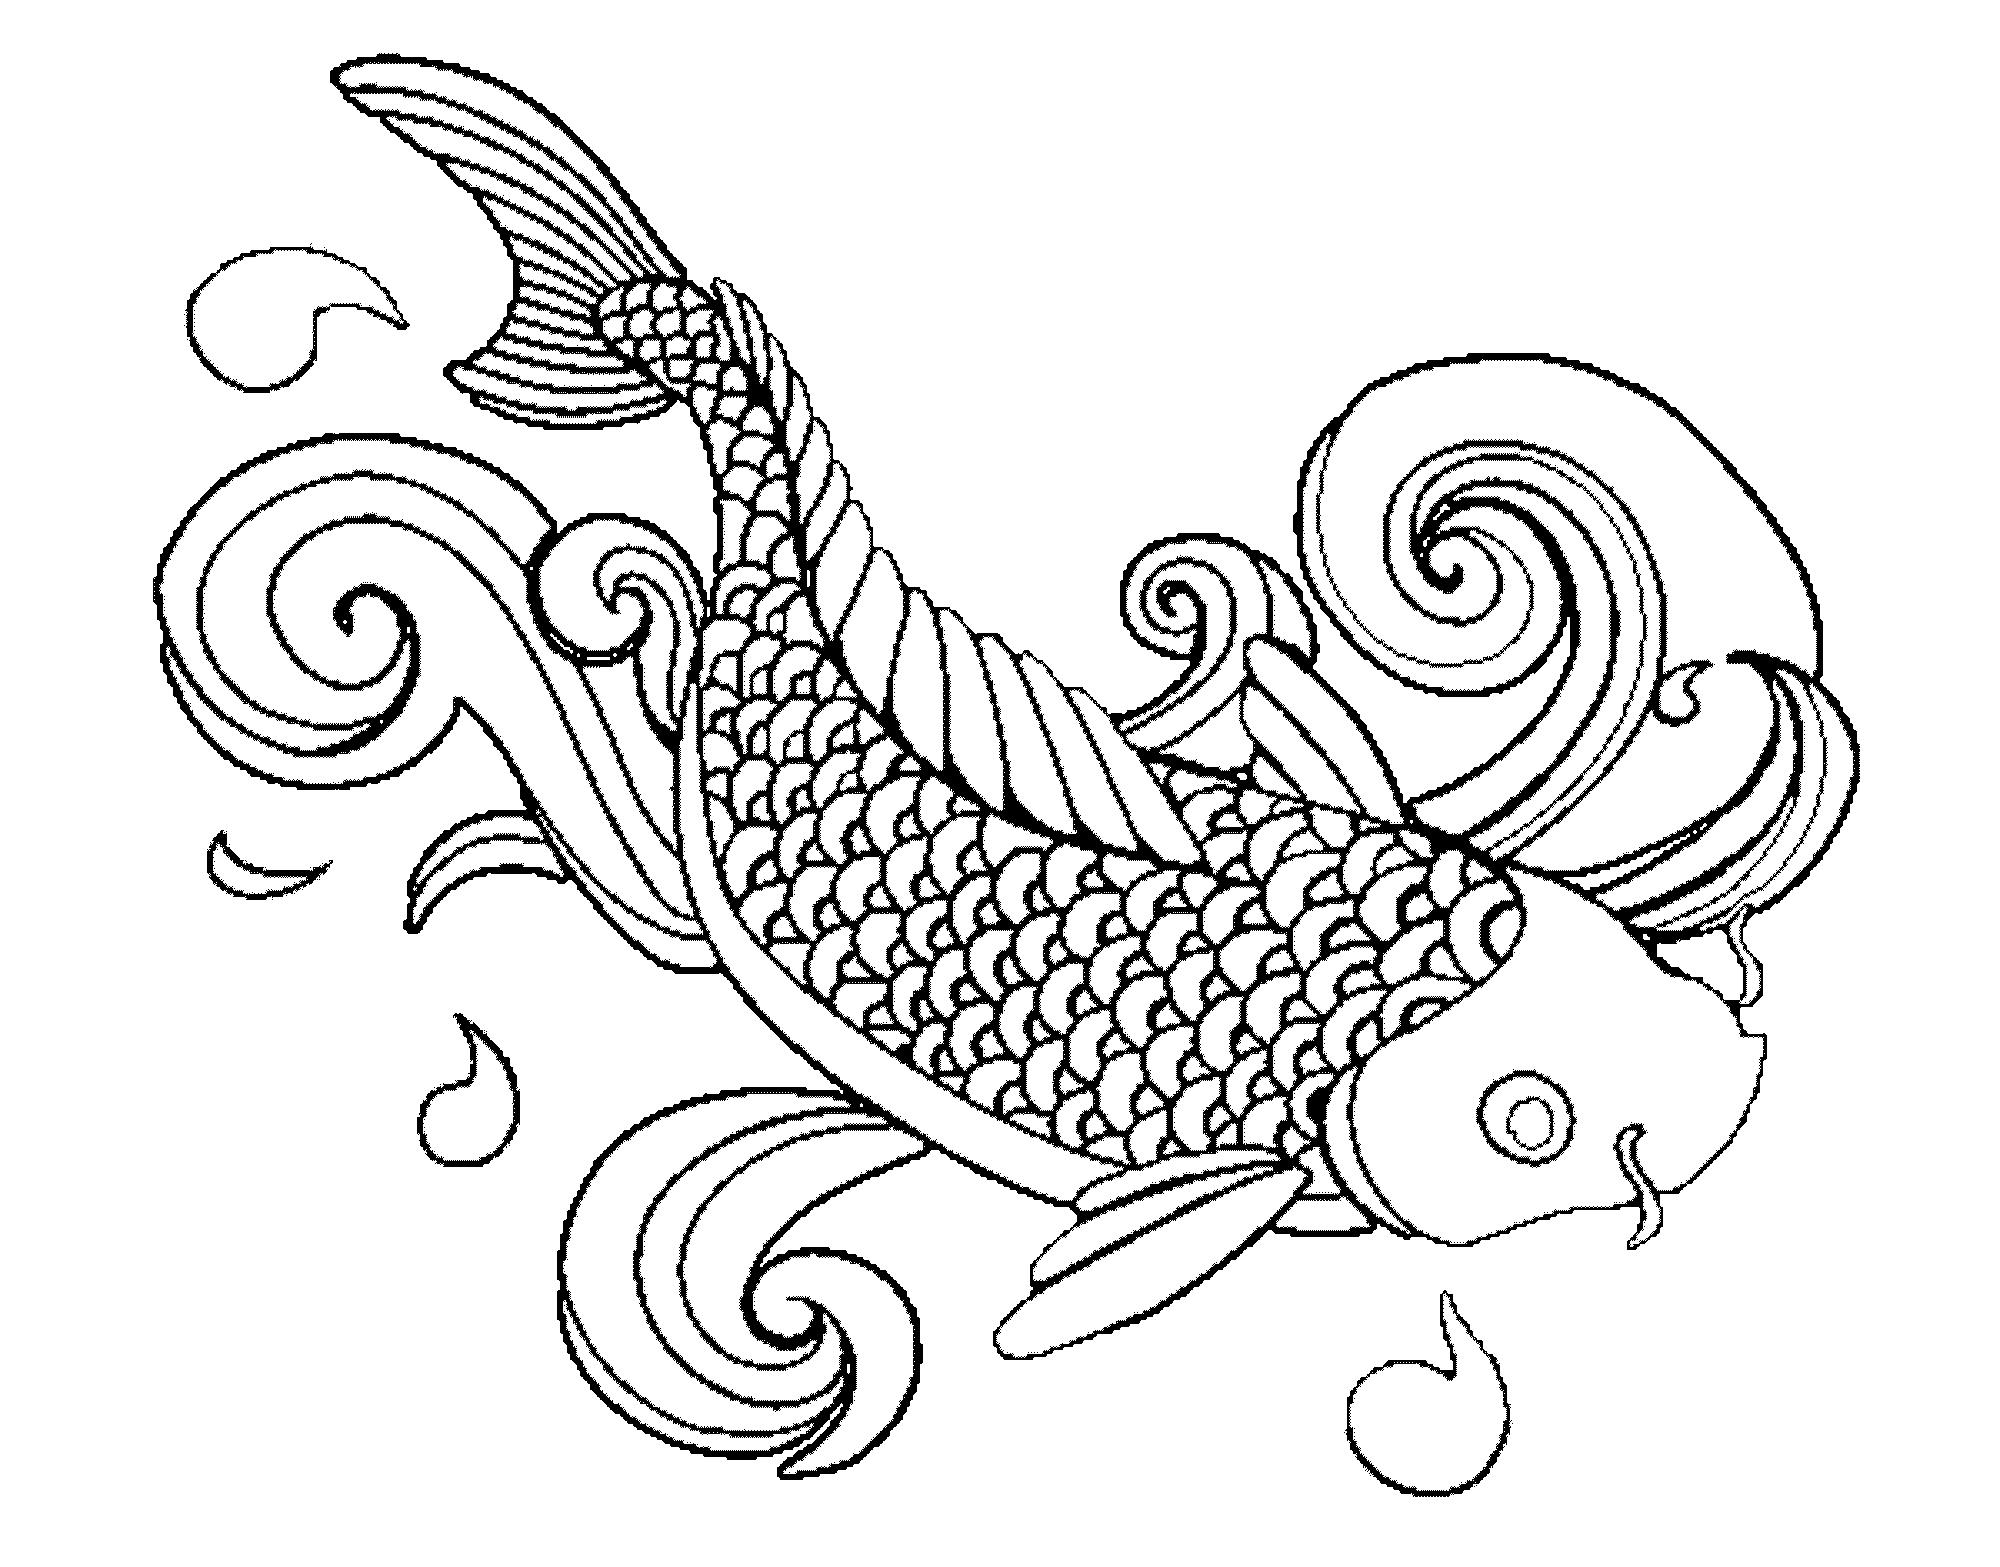 рыба карп картинка раскраска приморском курорте